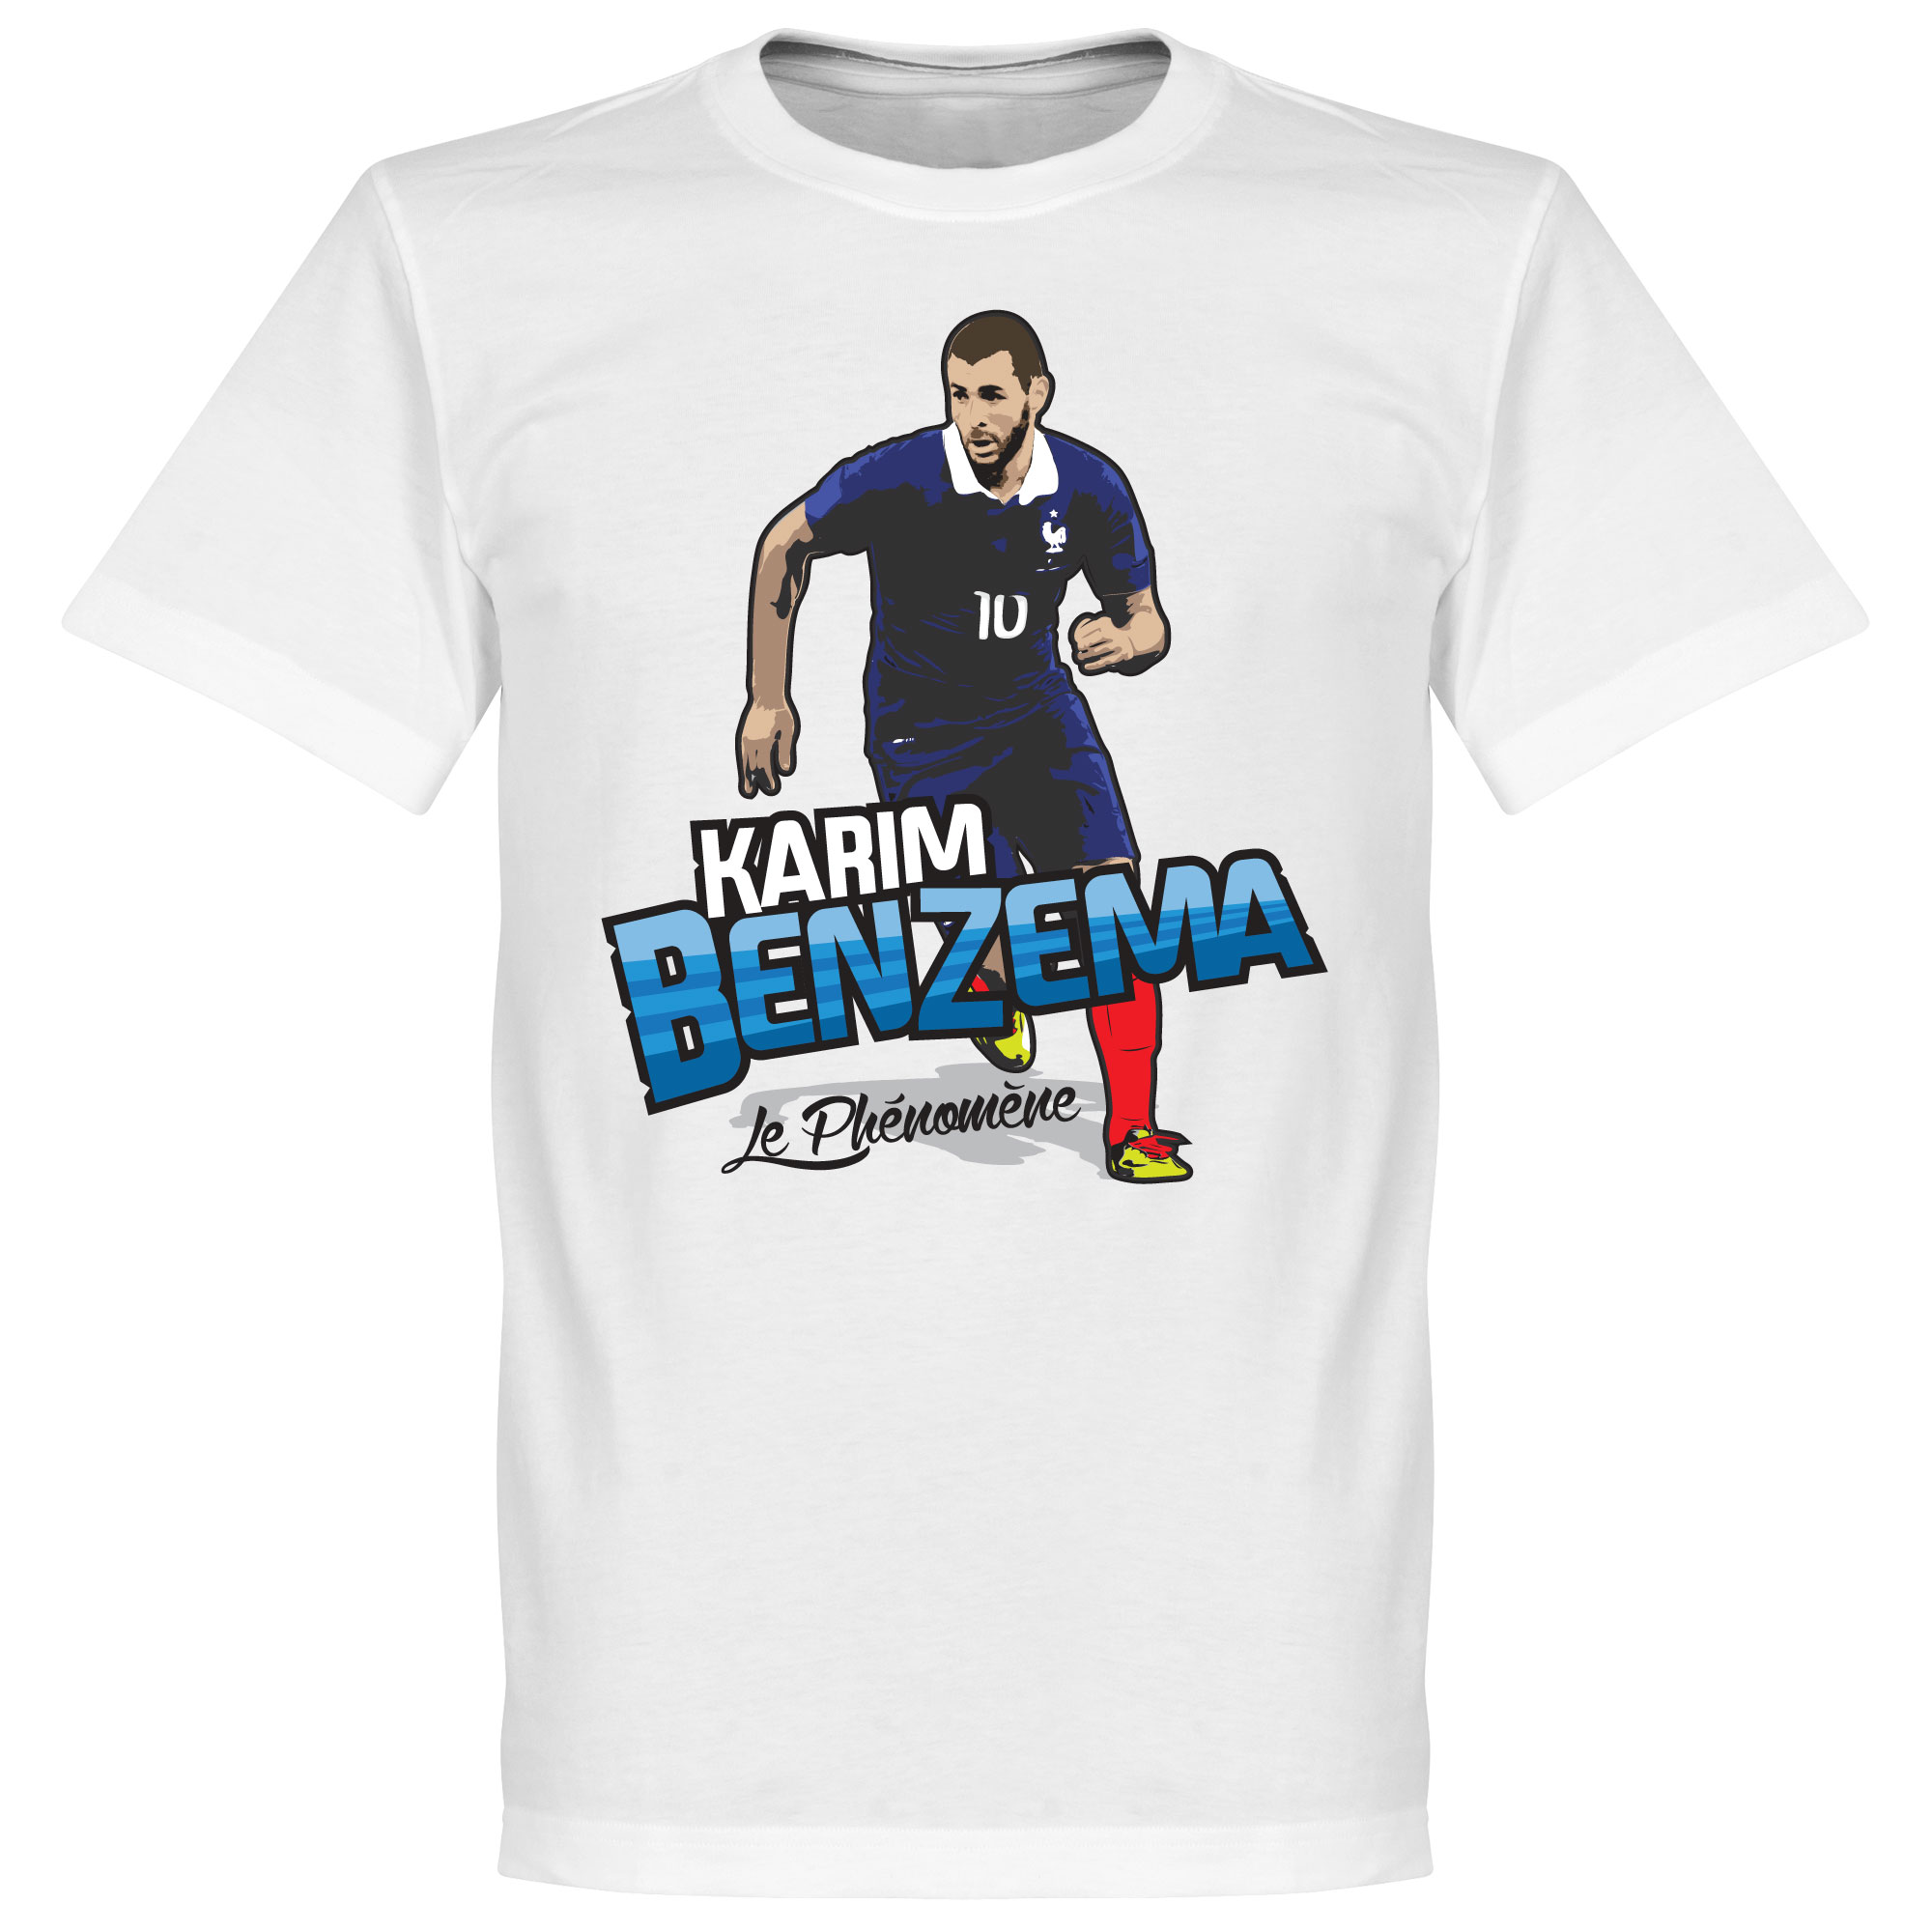 Karim Benzema La Phenoméne Tee - White - XL